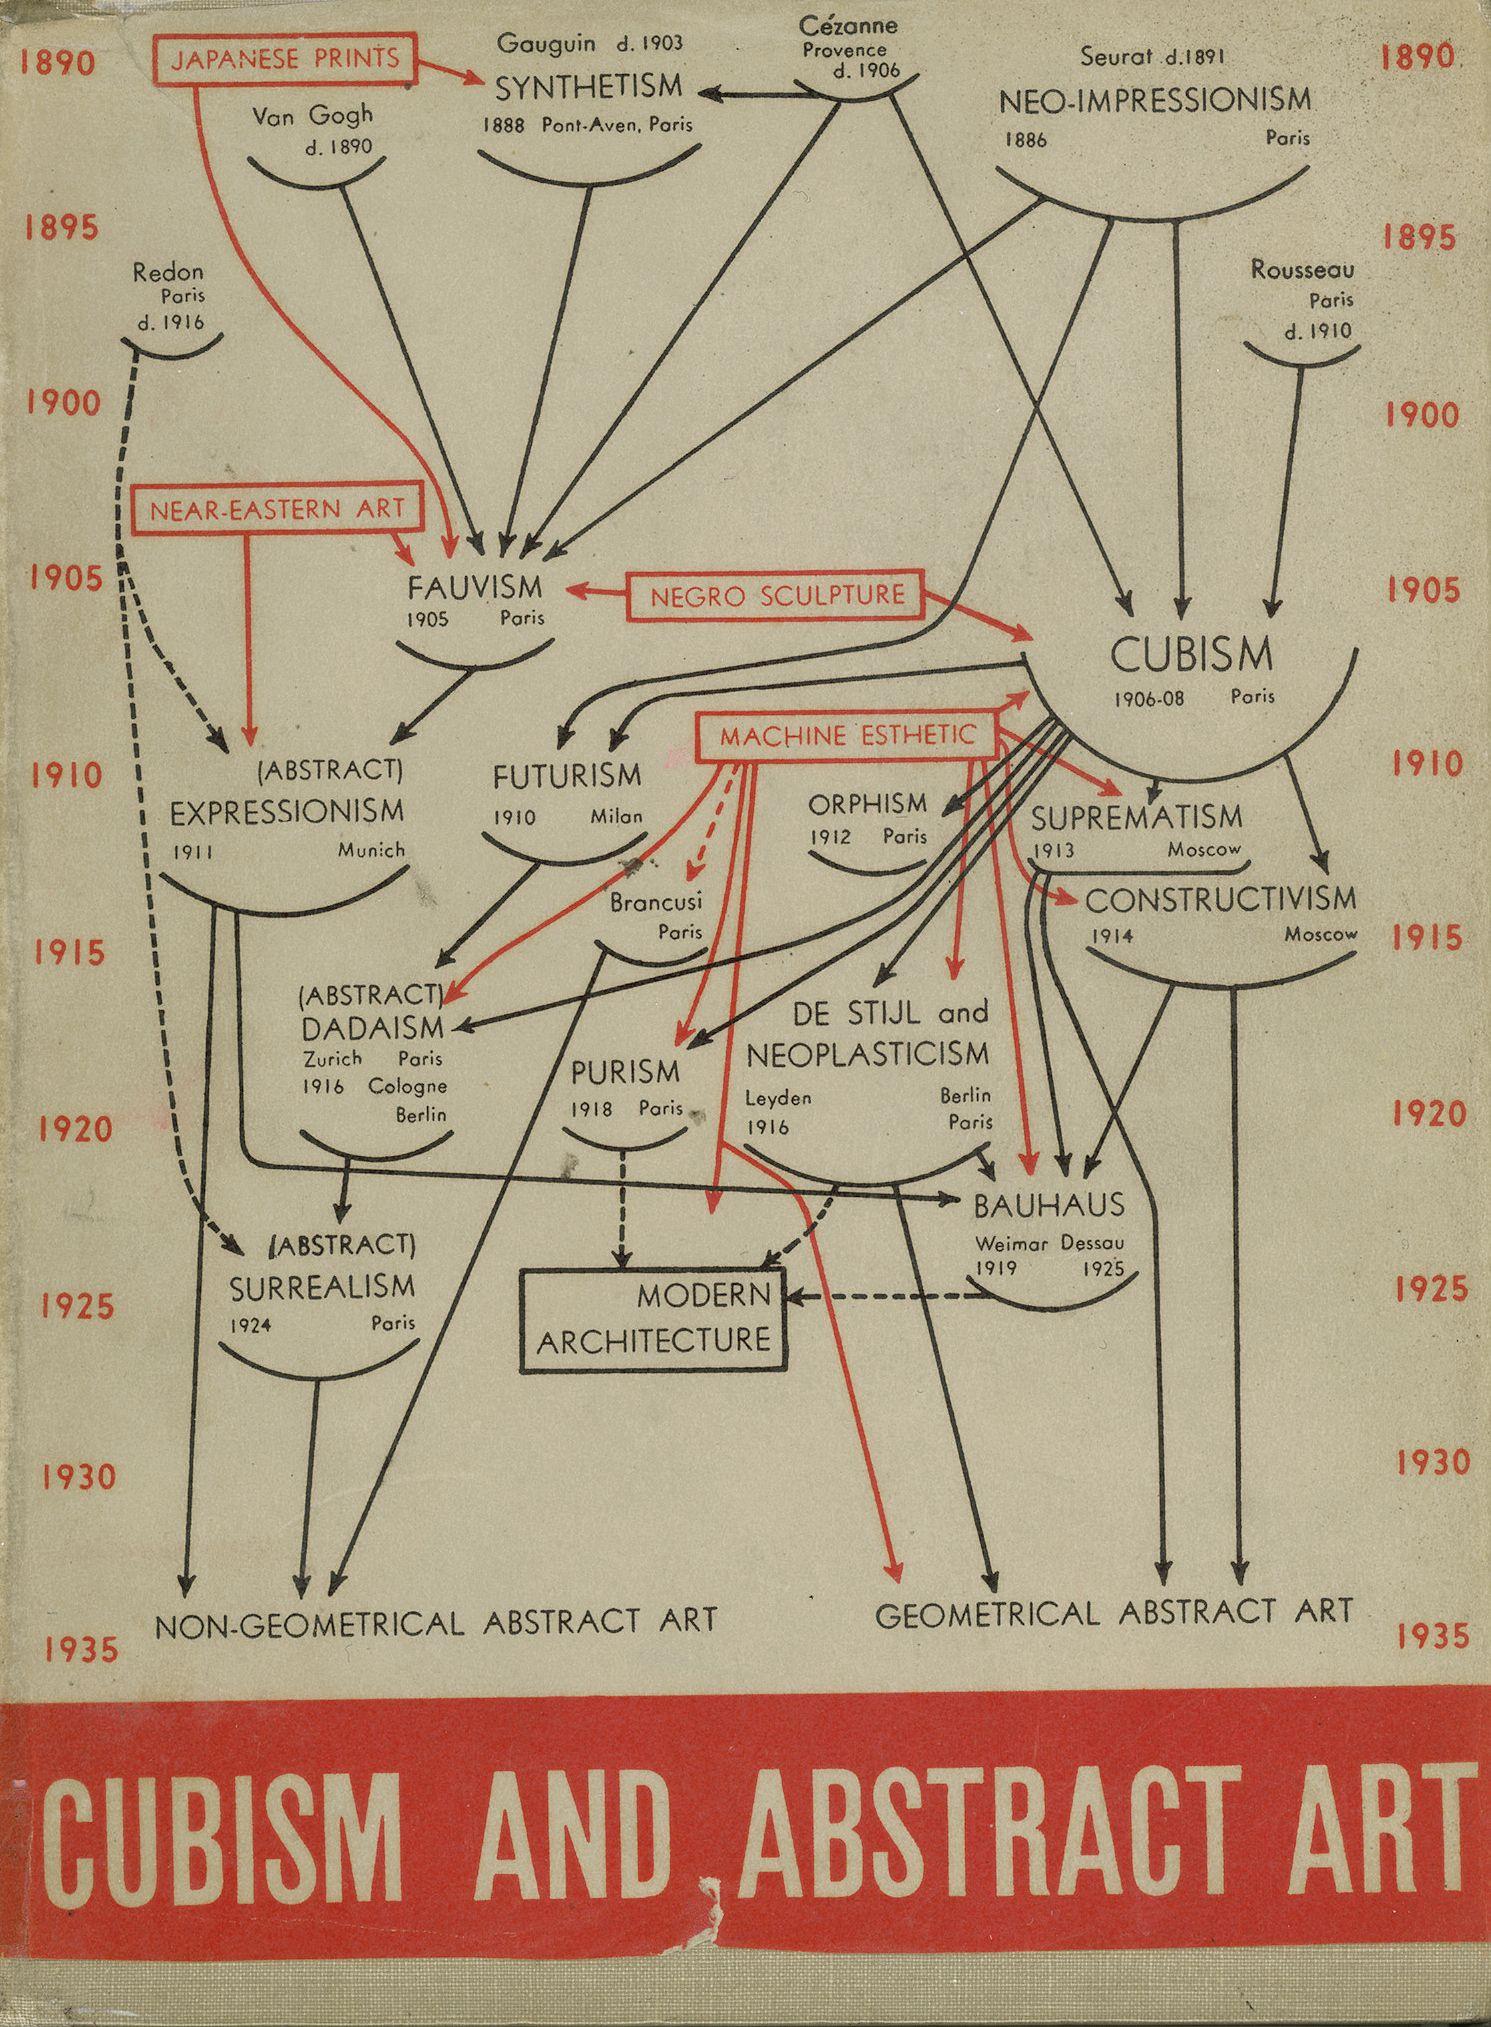 Alfred Barr Diagramm Zur Stilentwicklung Aus Alfred Barr Cubism And Abstract Art New York 1936 Museum Fur Moderne Kunst Kunstgeschichte Kunsterziehung